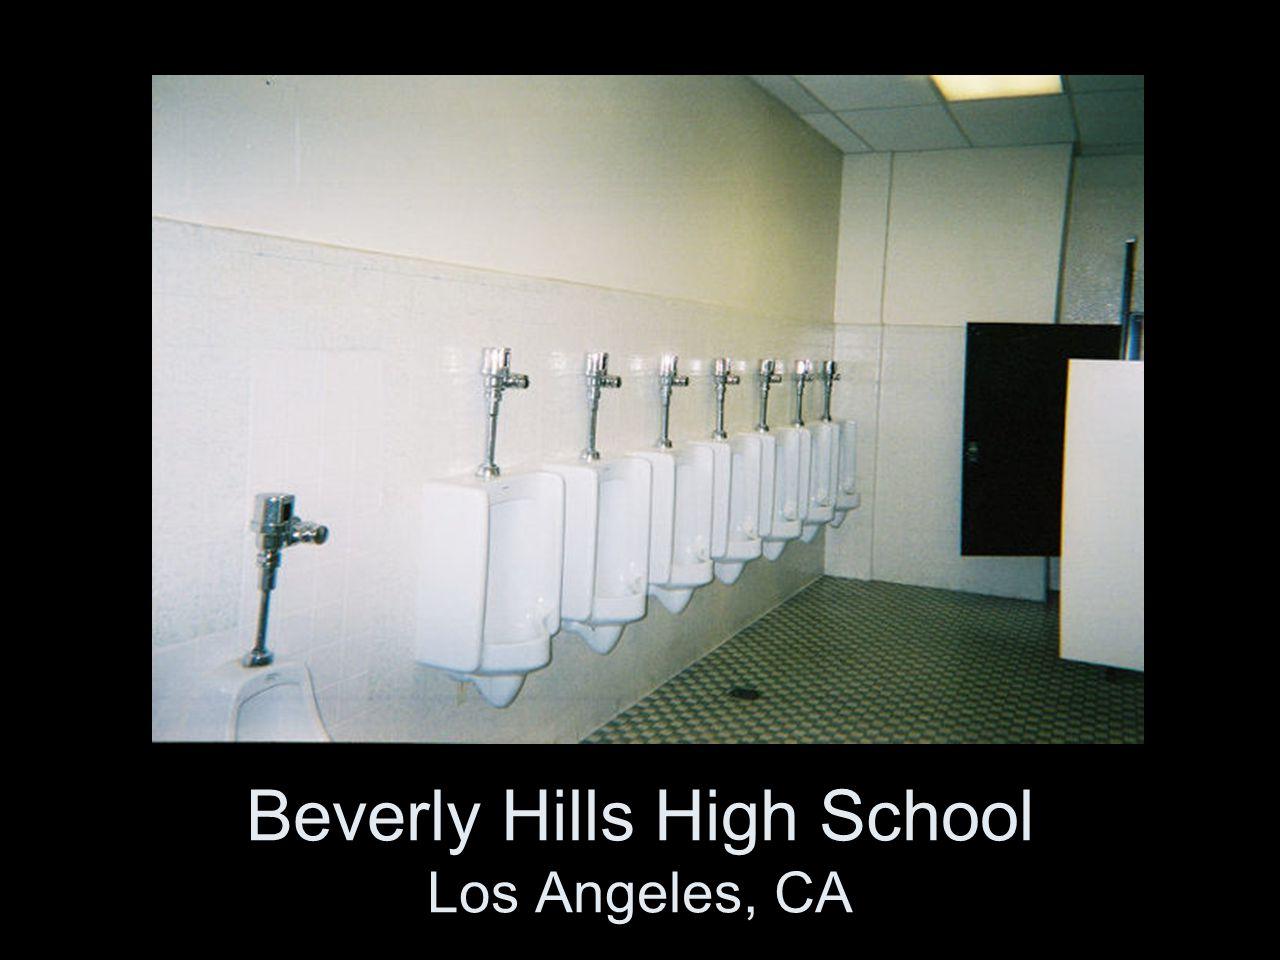 Beverly Hills High School Los Angeles, CA